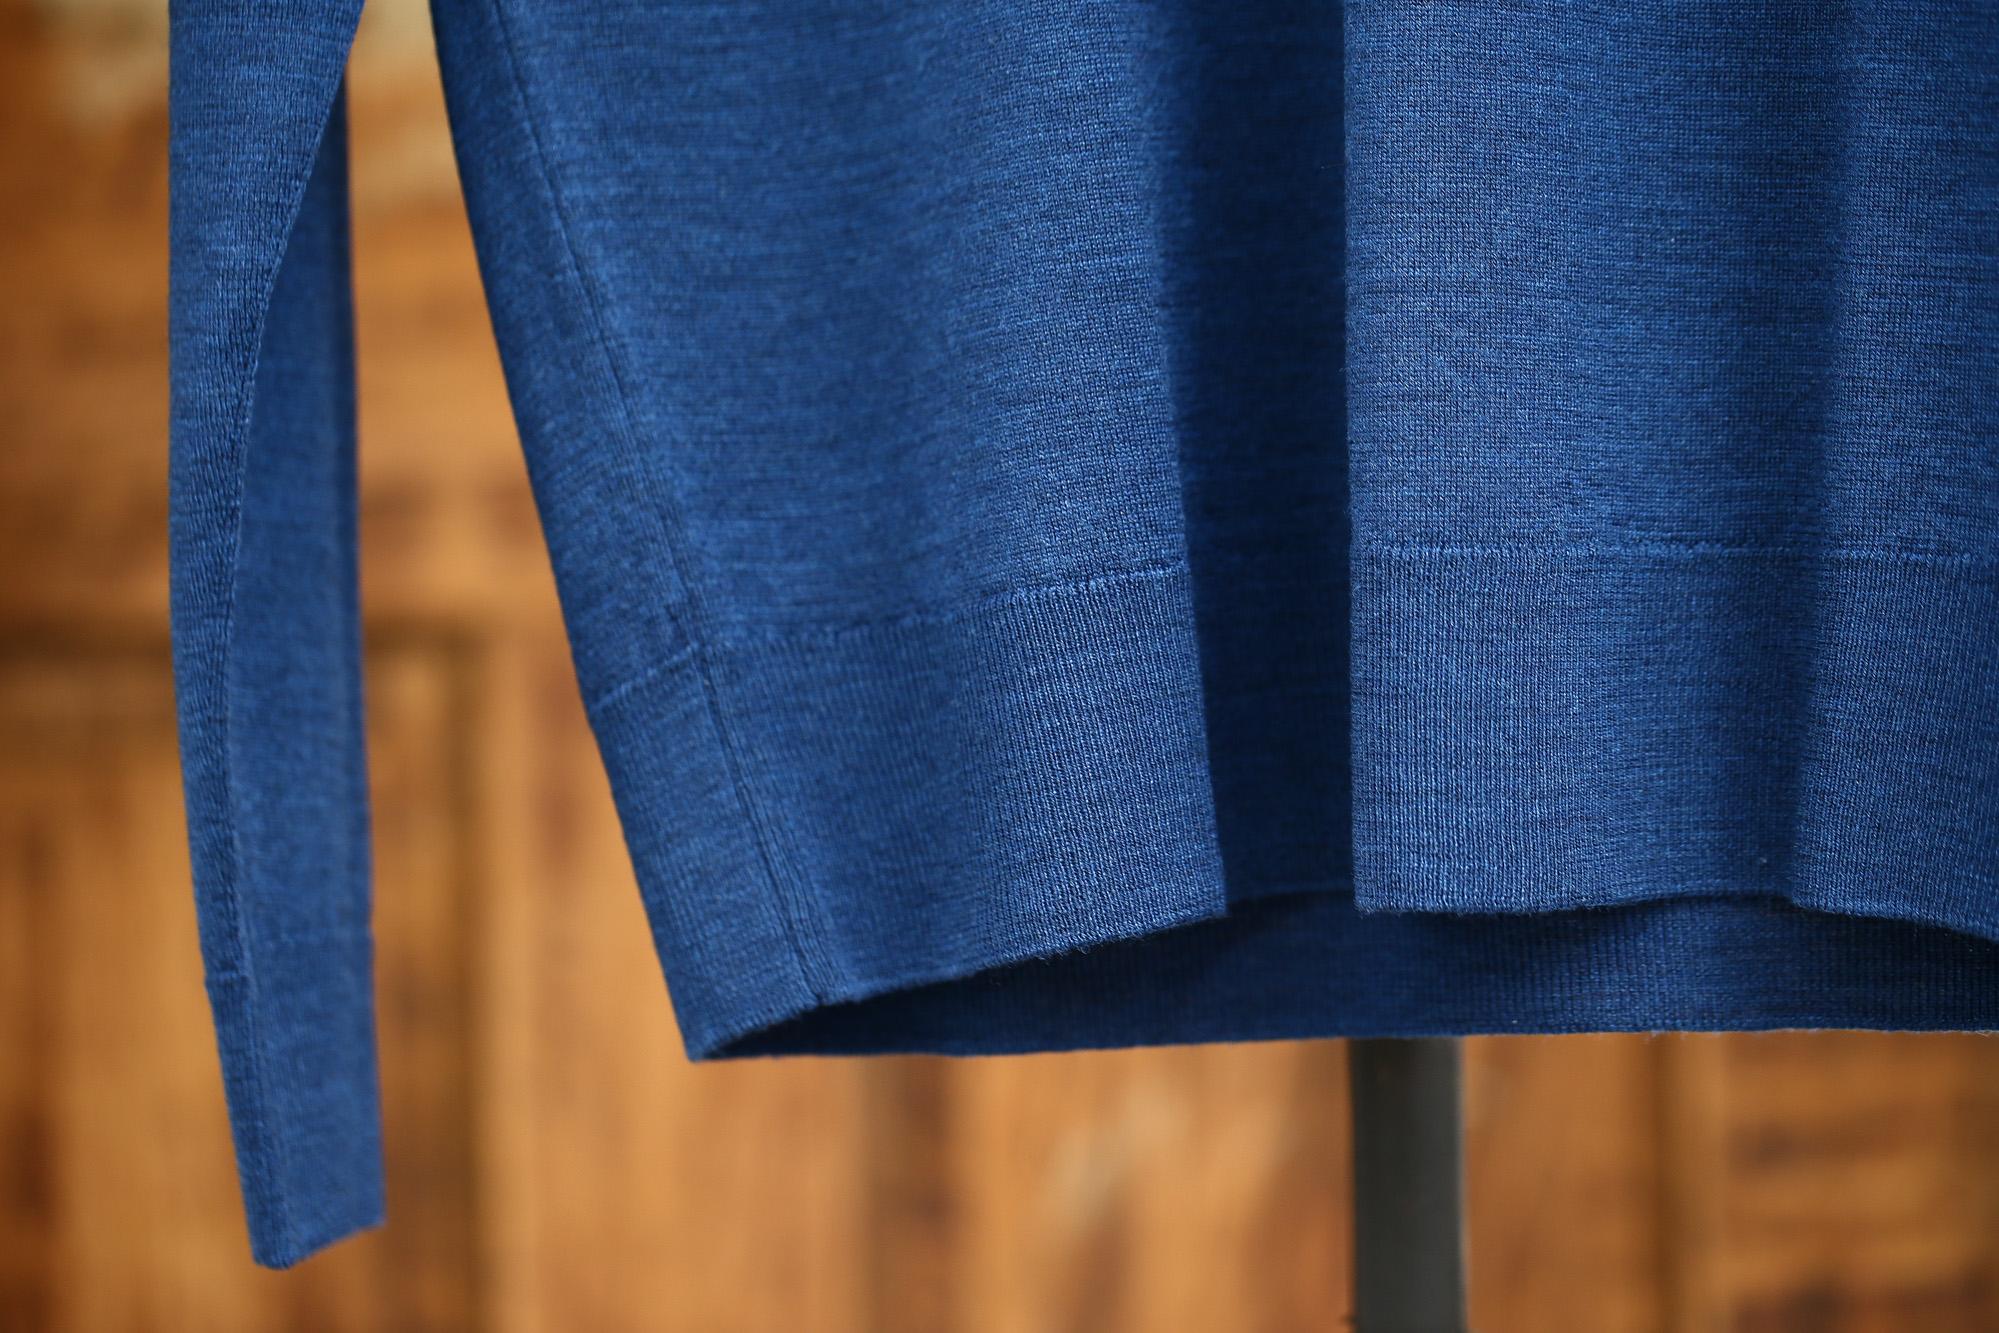 JOHN SMEDLEY (ジョンスメドレー) CLEVES SLIM FIT メリノウール100% ハイゲージニット クルーネックセーター INDIGO (インディゴ) MADE IN GREAT BRITAIN(イギリス製) 2016 秋冬新作 スメドレー 愛知 名古屋 ZODIAC ゾディアック ニット ミッドランド 名古屋 紺 ネイビー